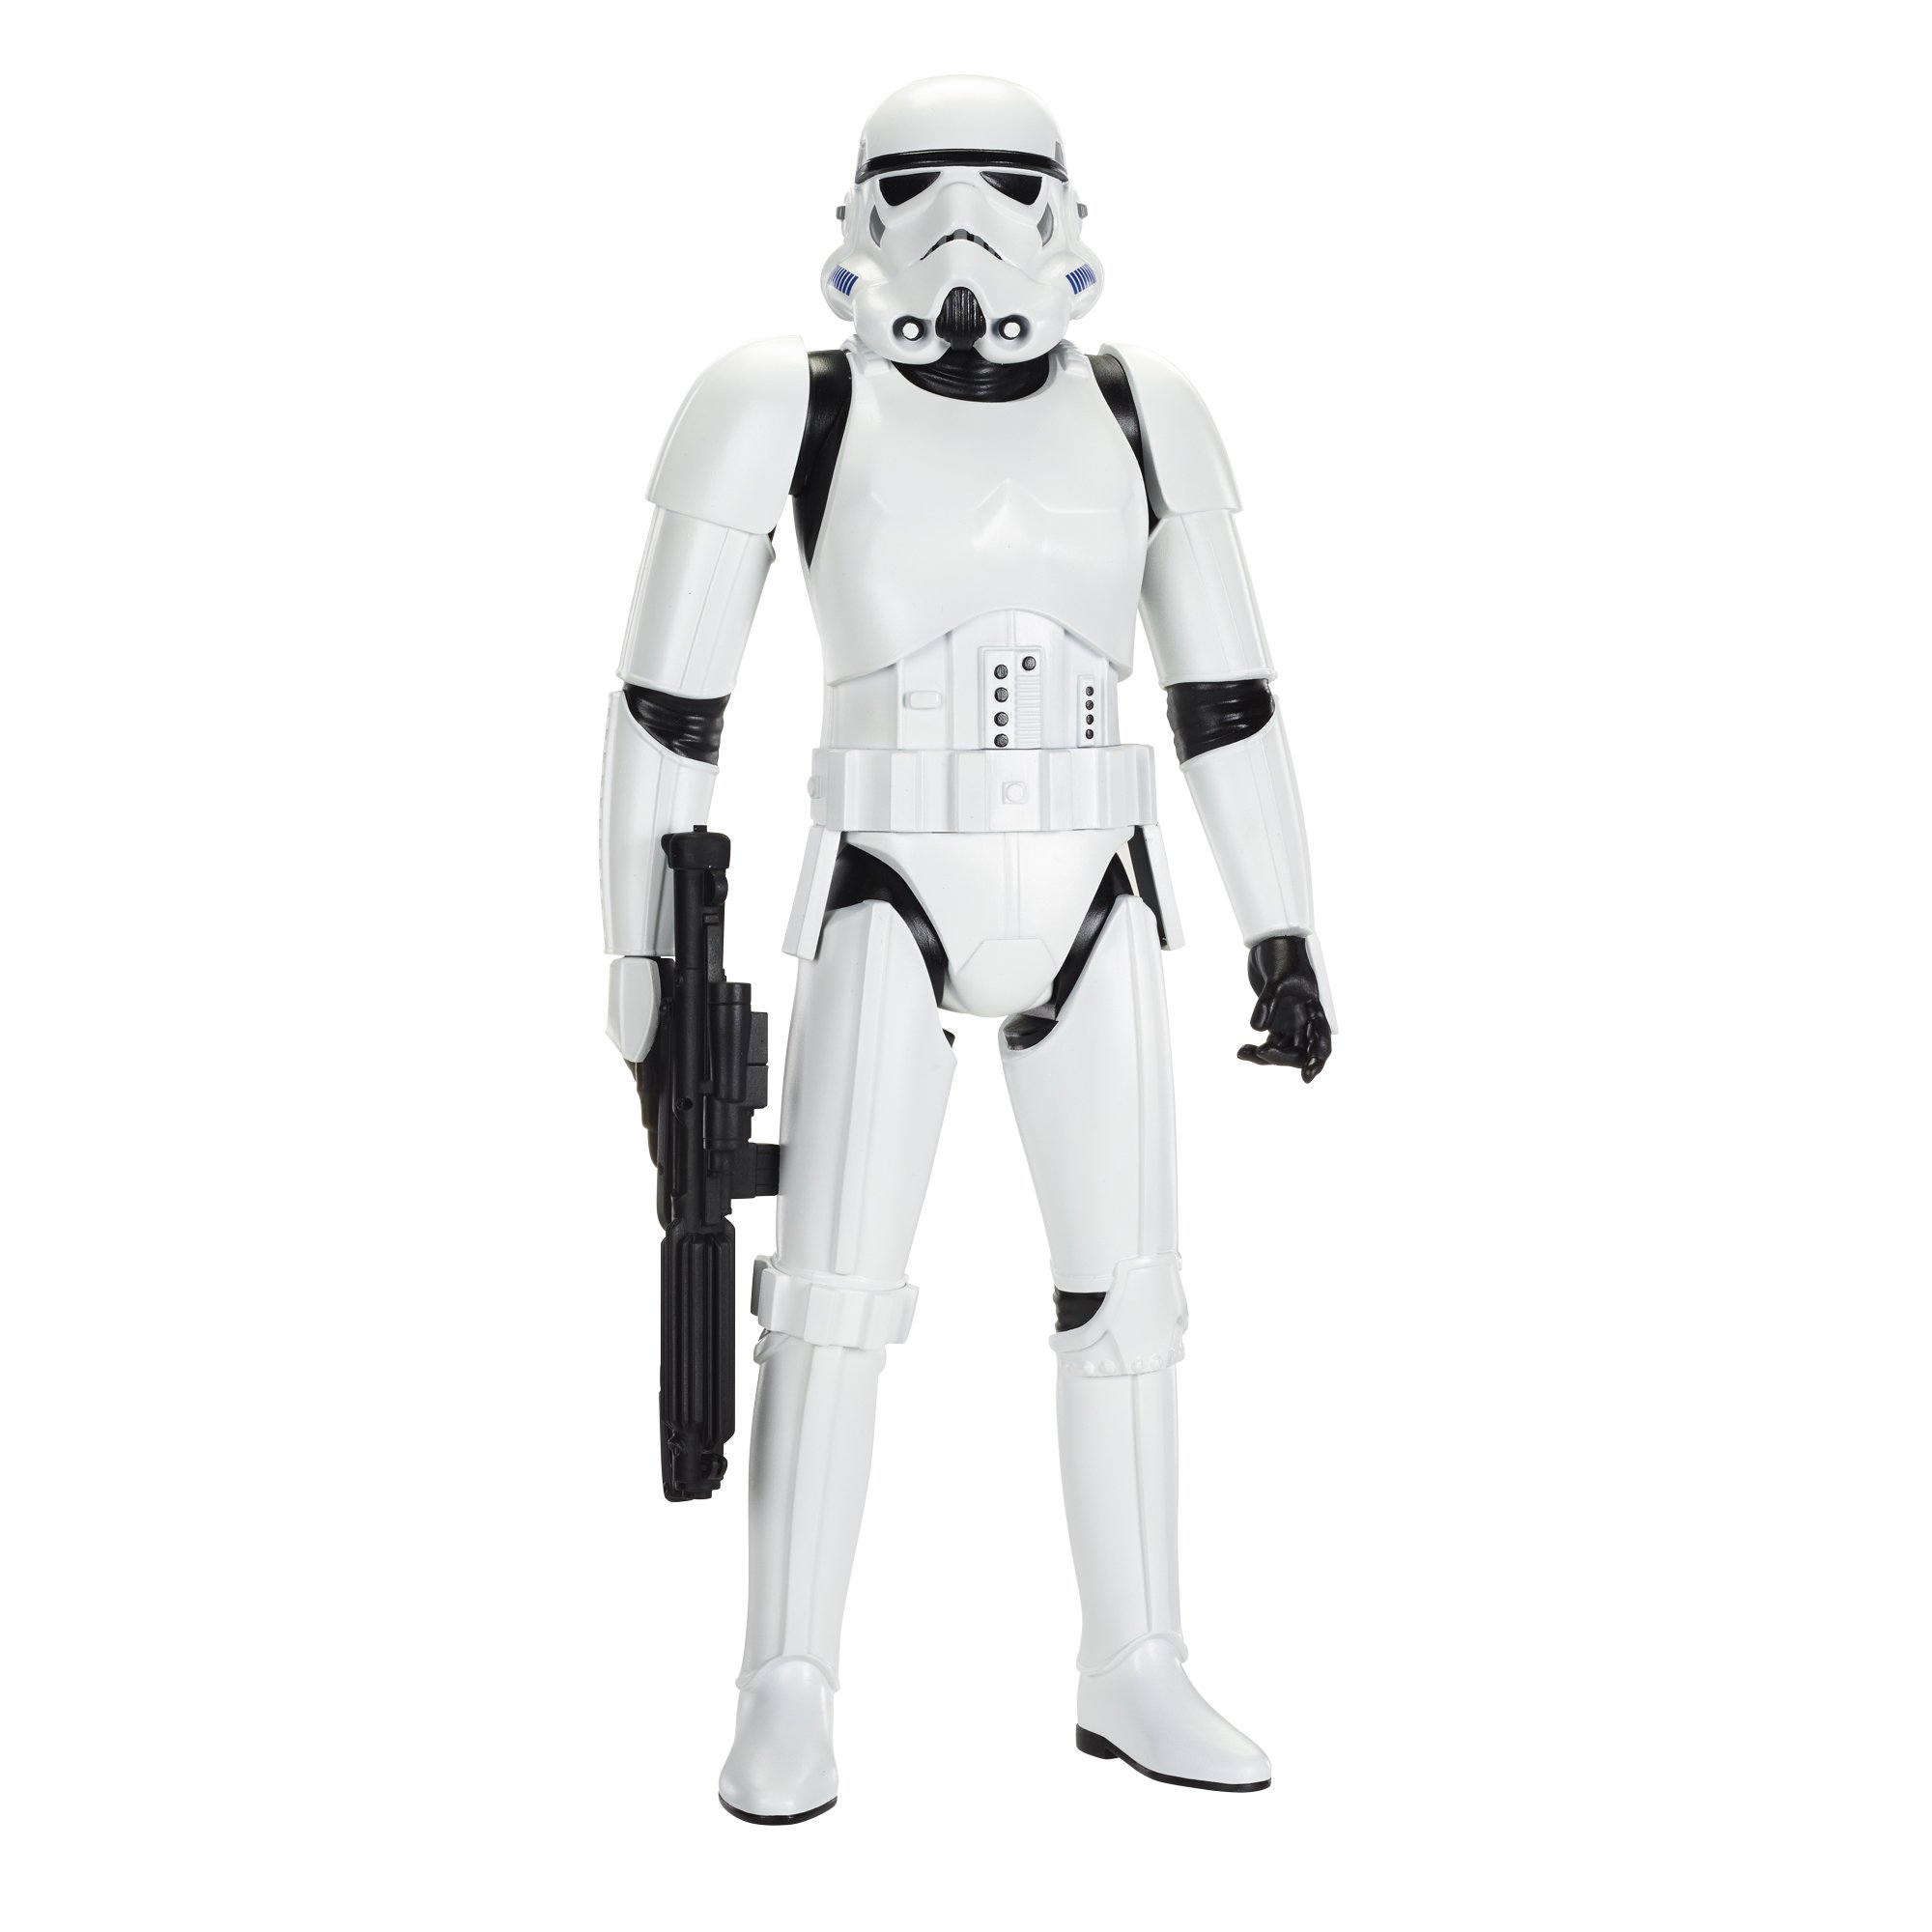 Rogue One Stormtrooper Big Figure